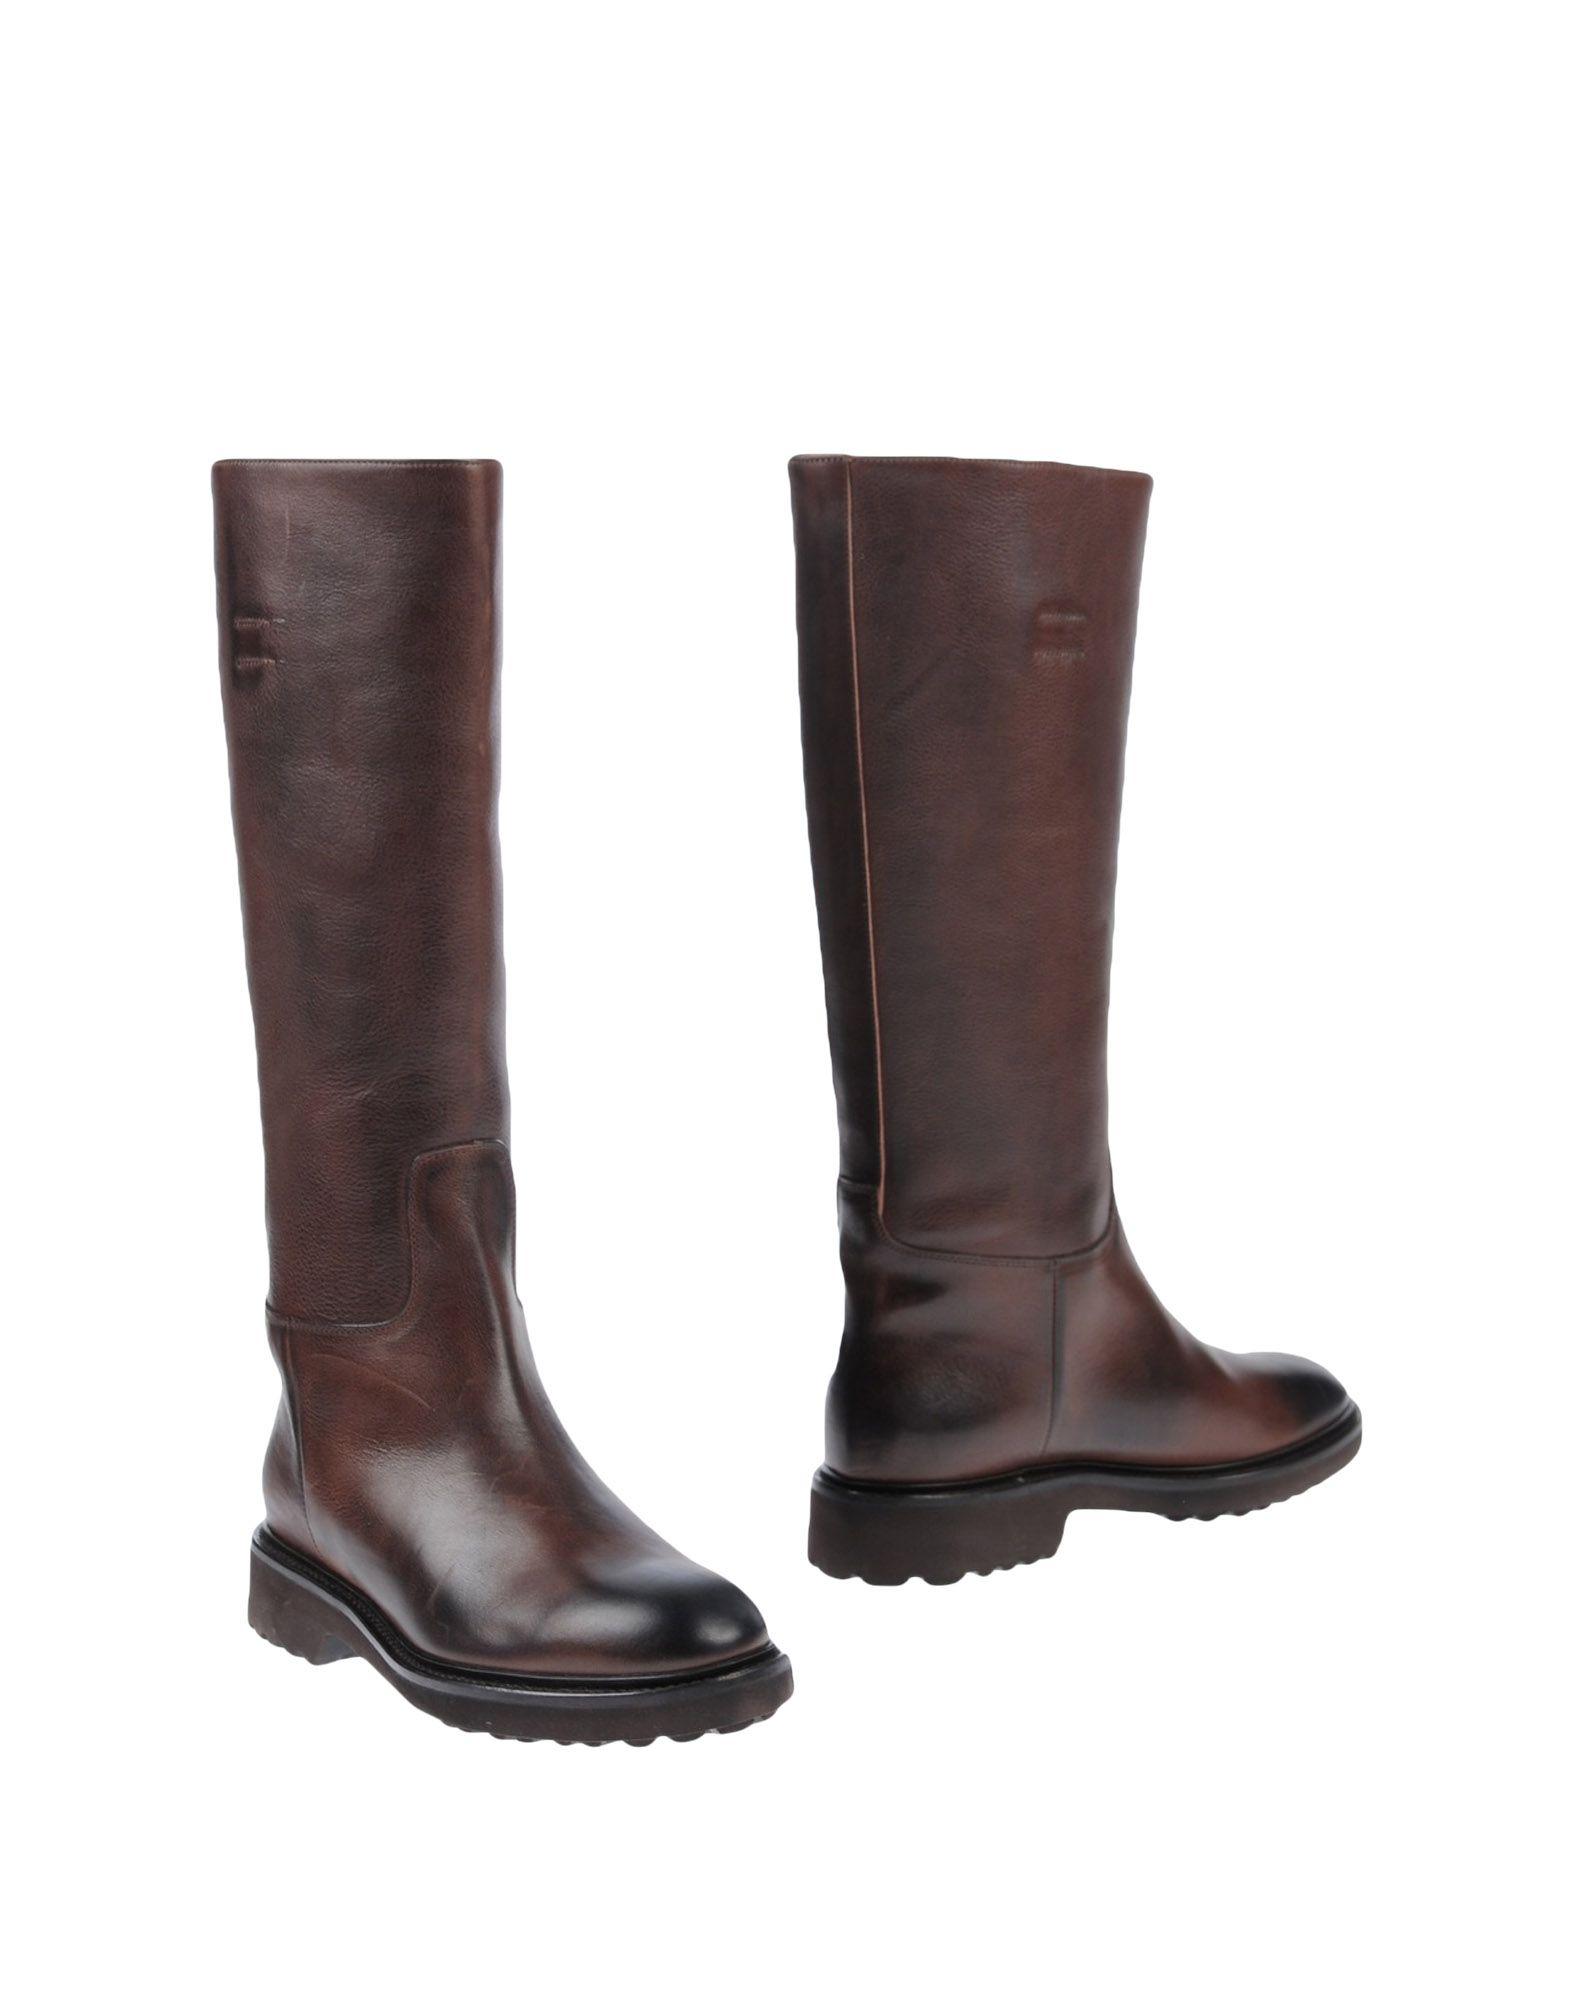 Doucal's Stiefel Damen  11506665OS Schuhe Heiße Schuhe 11506665OS e5089f